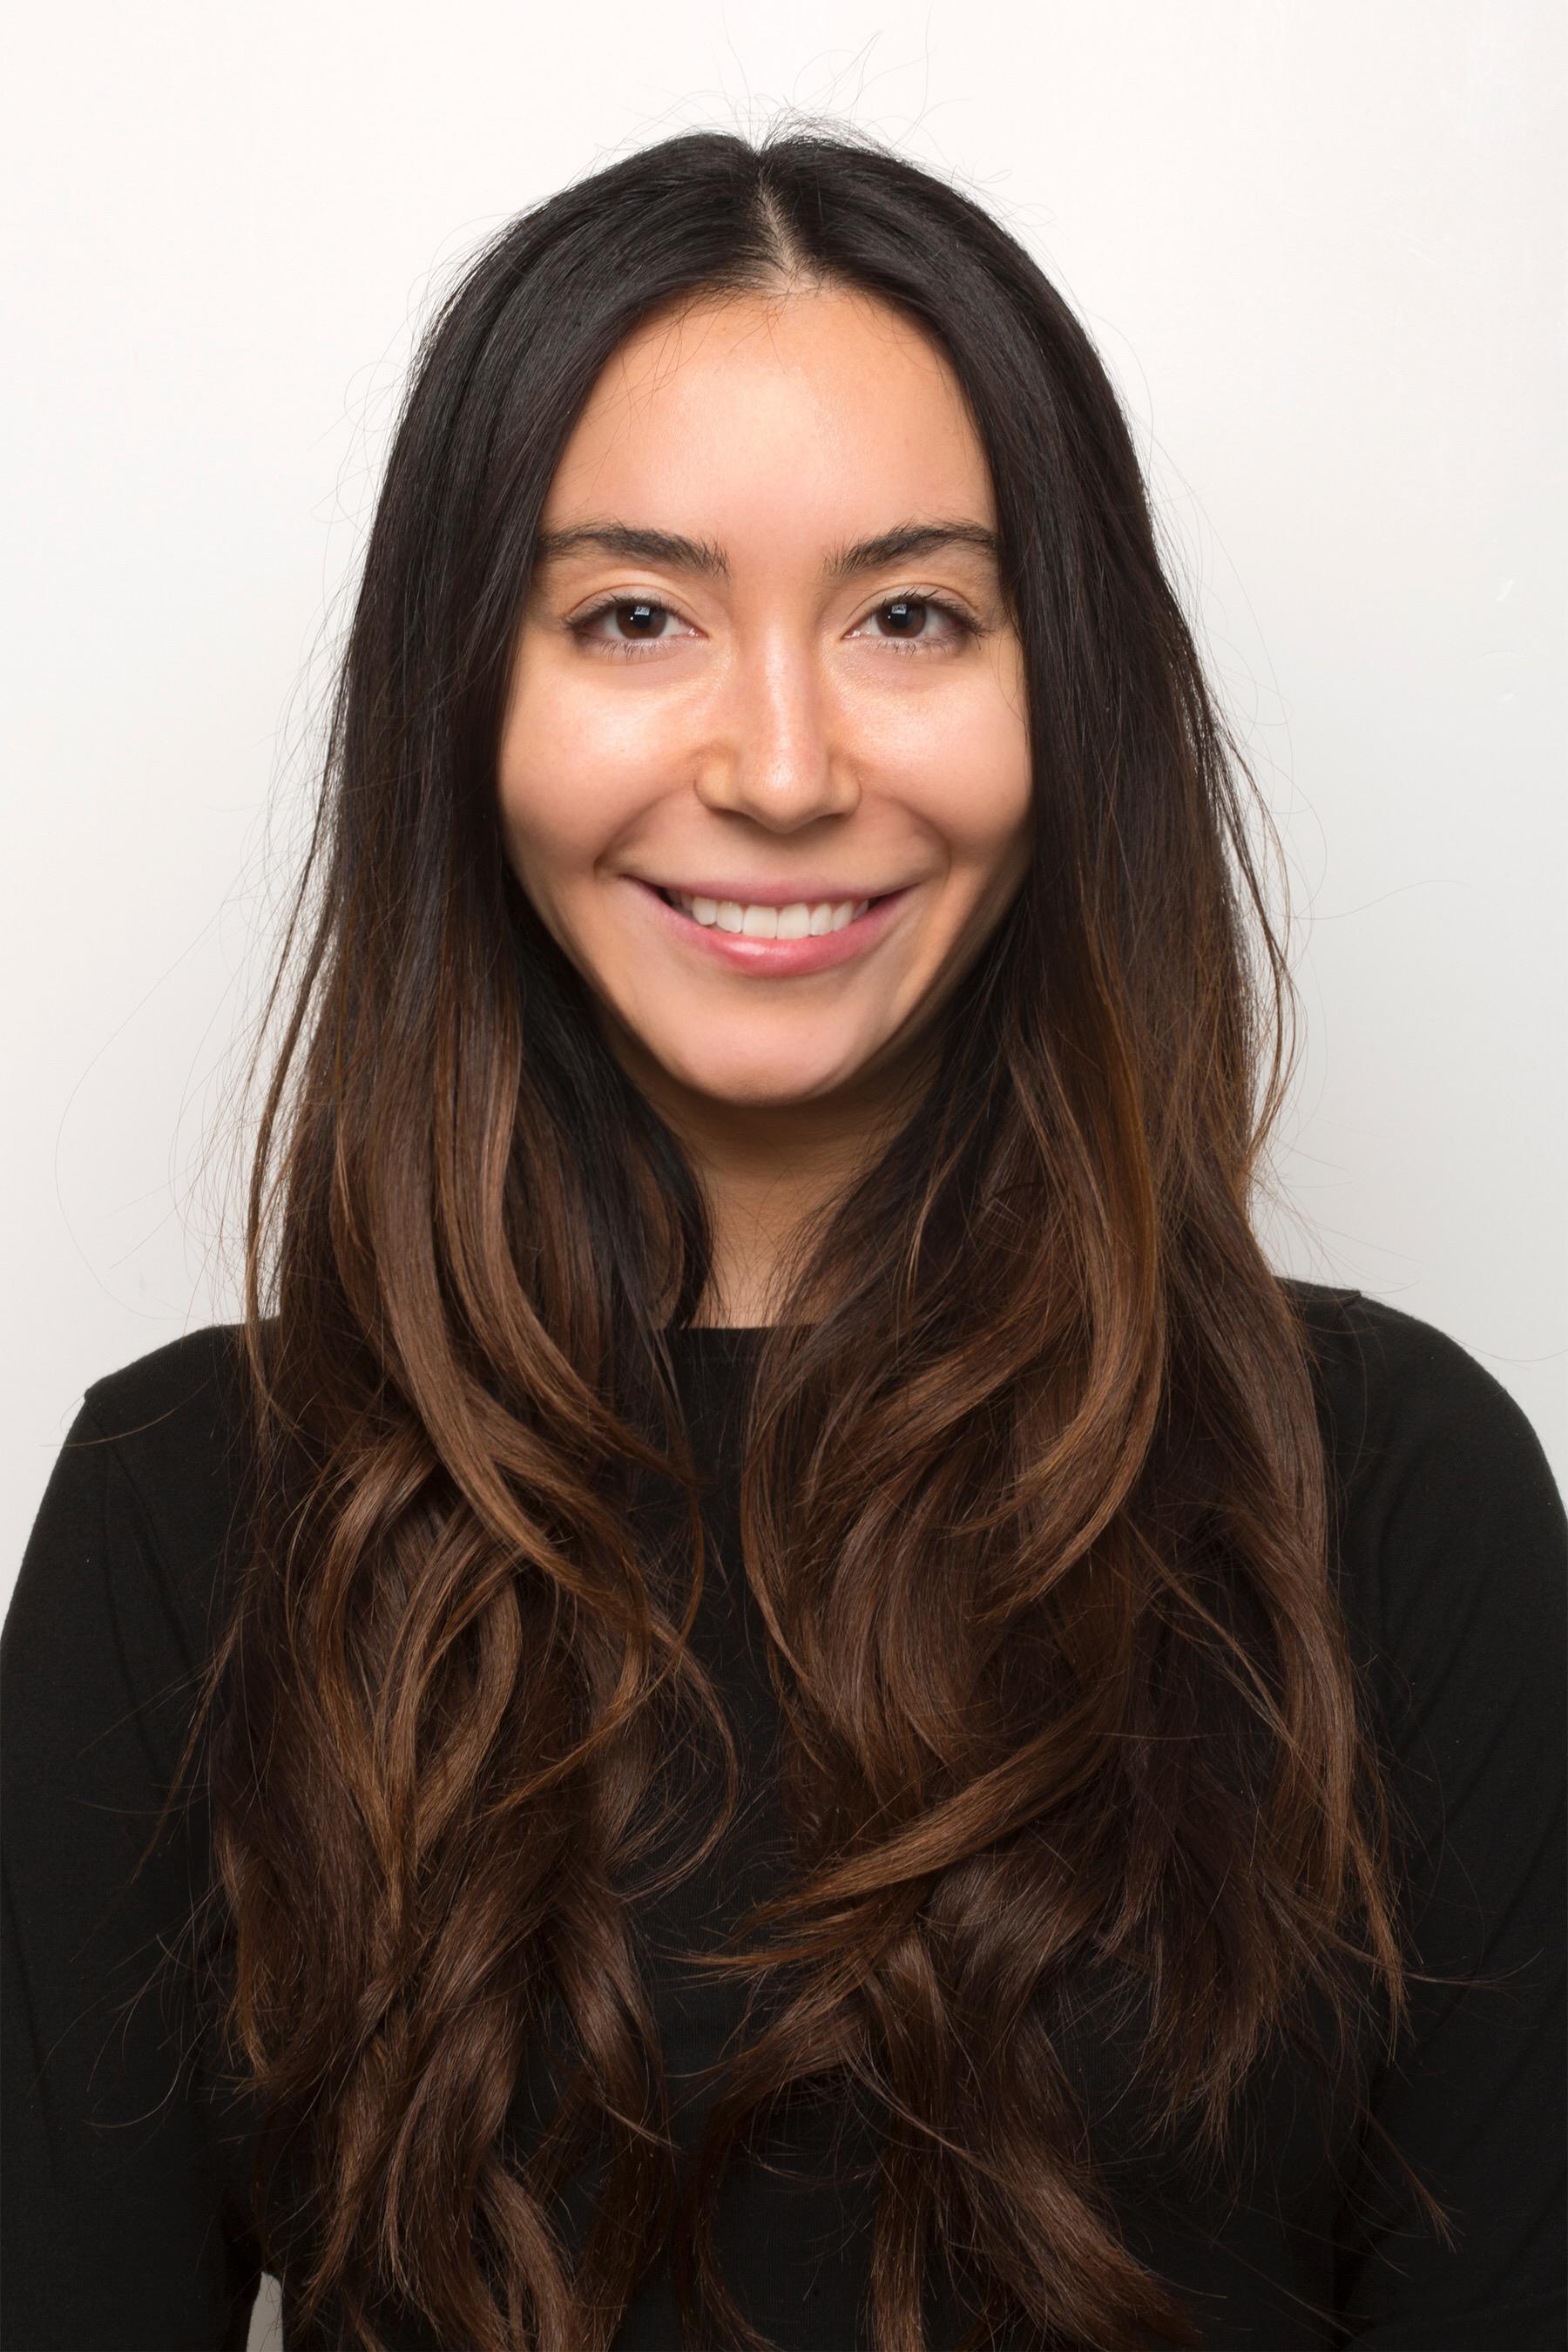 Erica Braverman Headshot.JPG